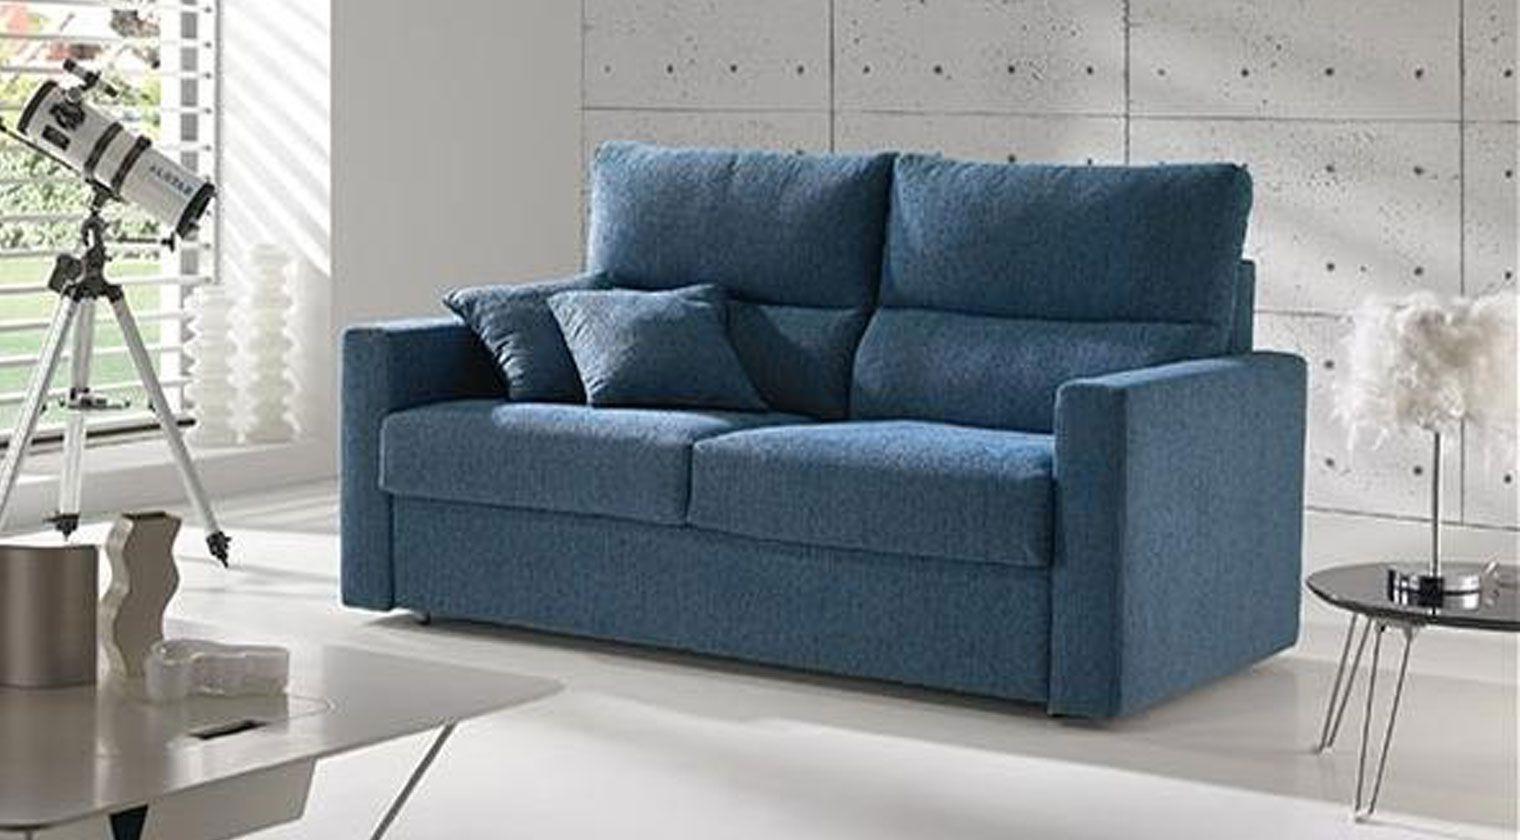 Sofa Cama Comodo Ftd8 sofa Cama Odo Y Barato Deco Casas